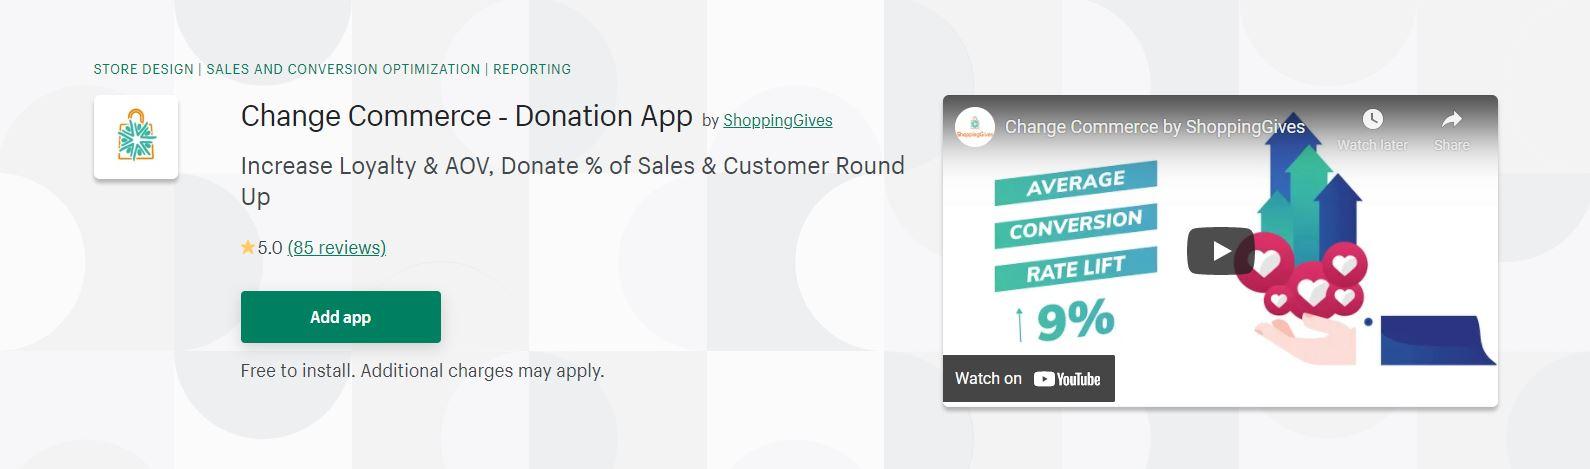 Change Commerce ‑ Donation App